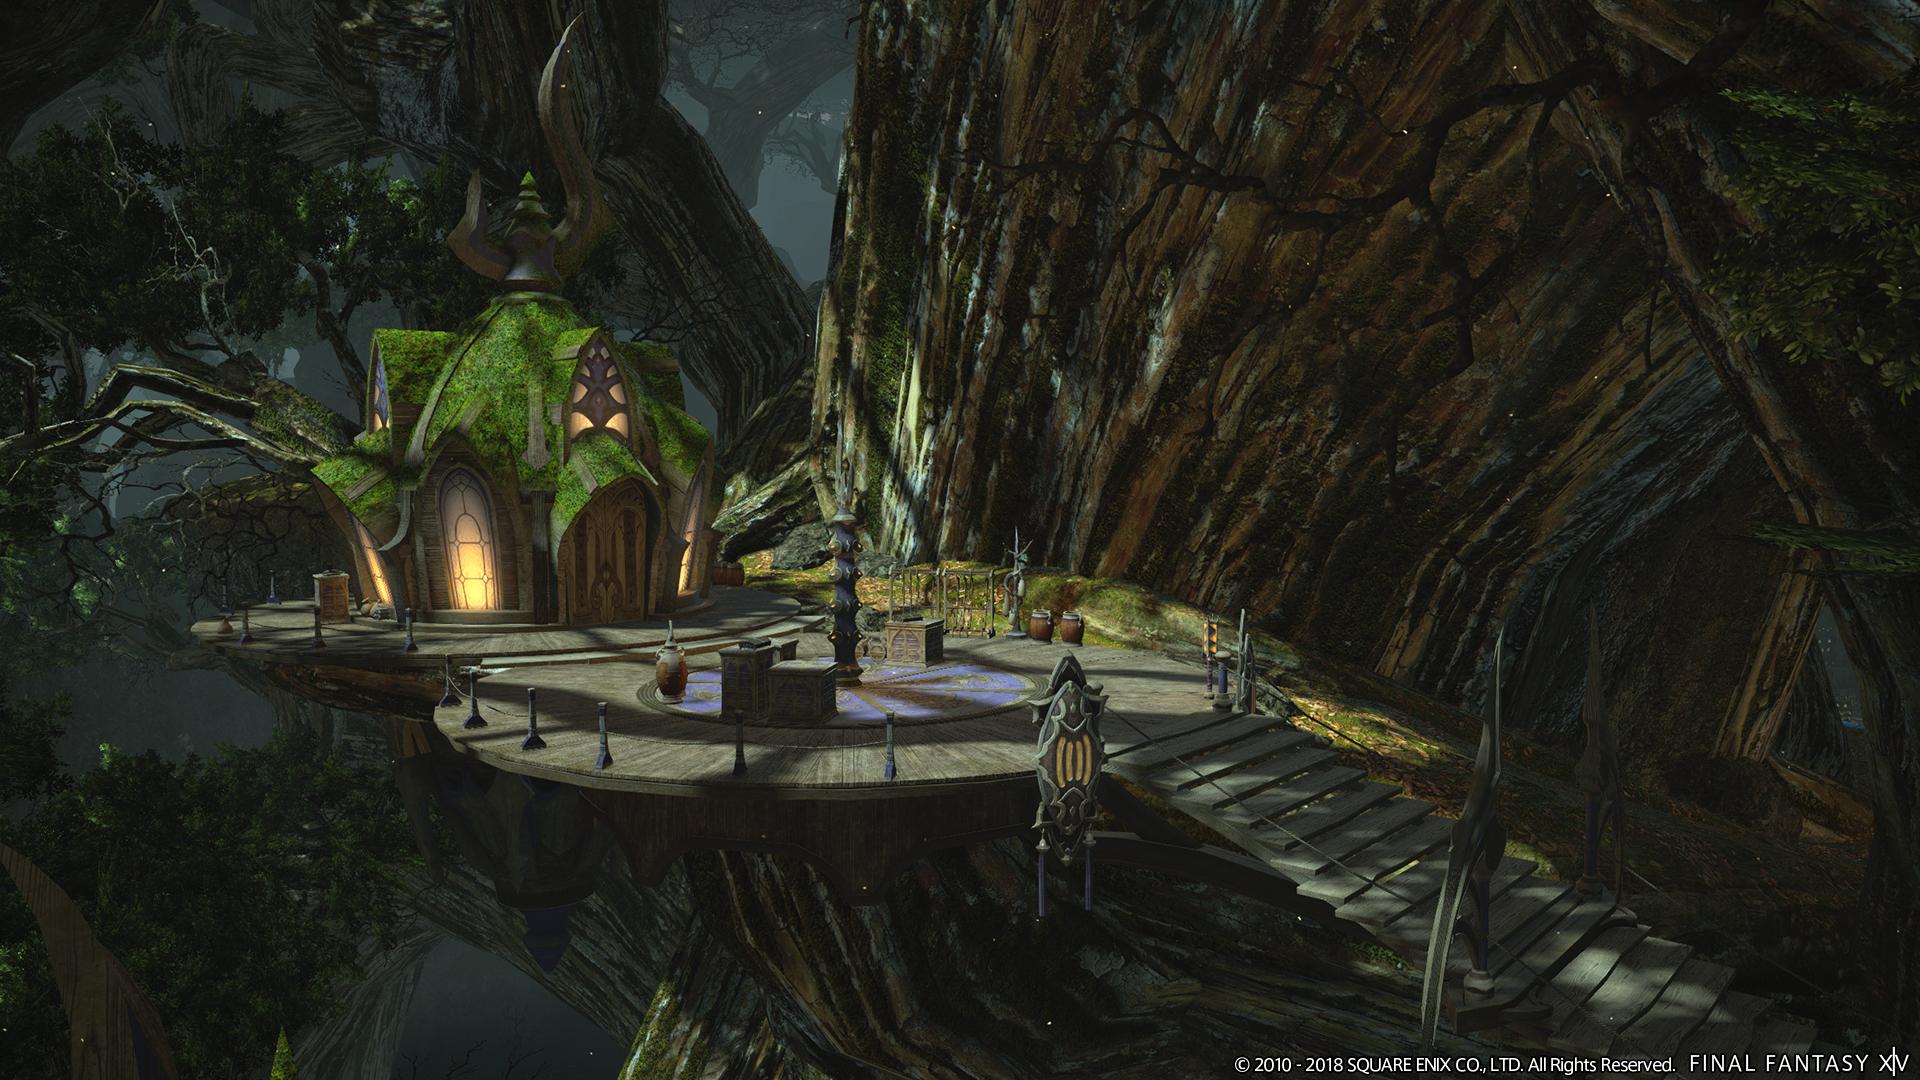 Final Fantasy XIV's third expansion 'Shadowbringers